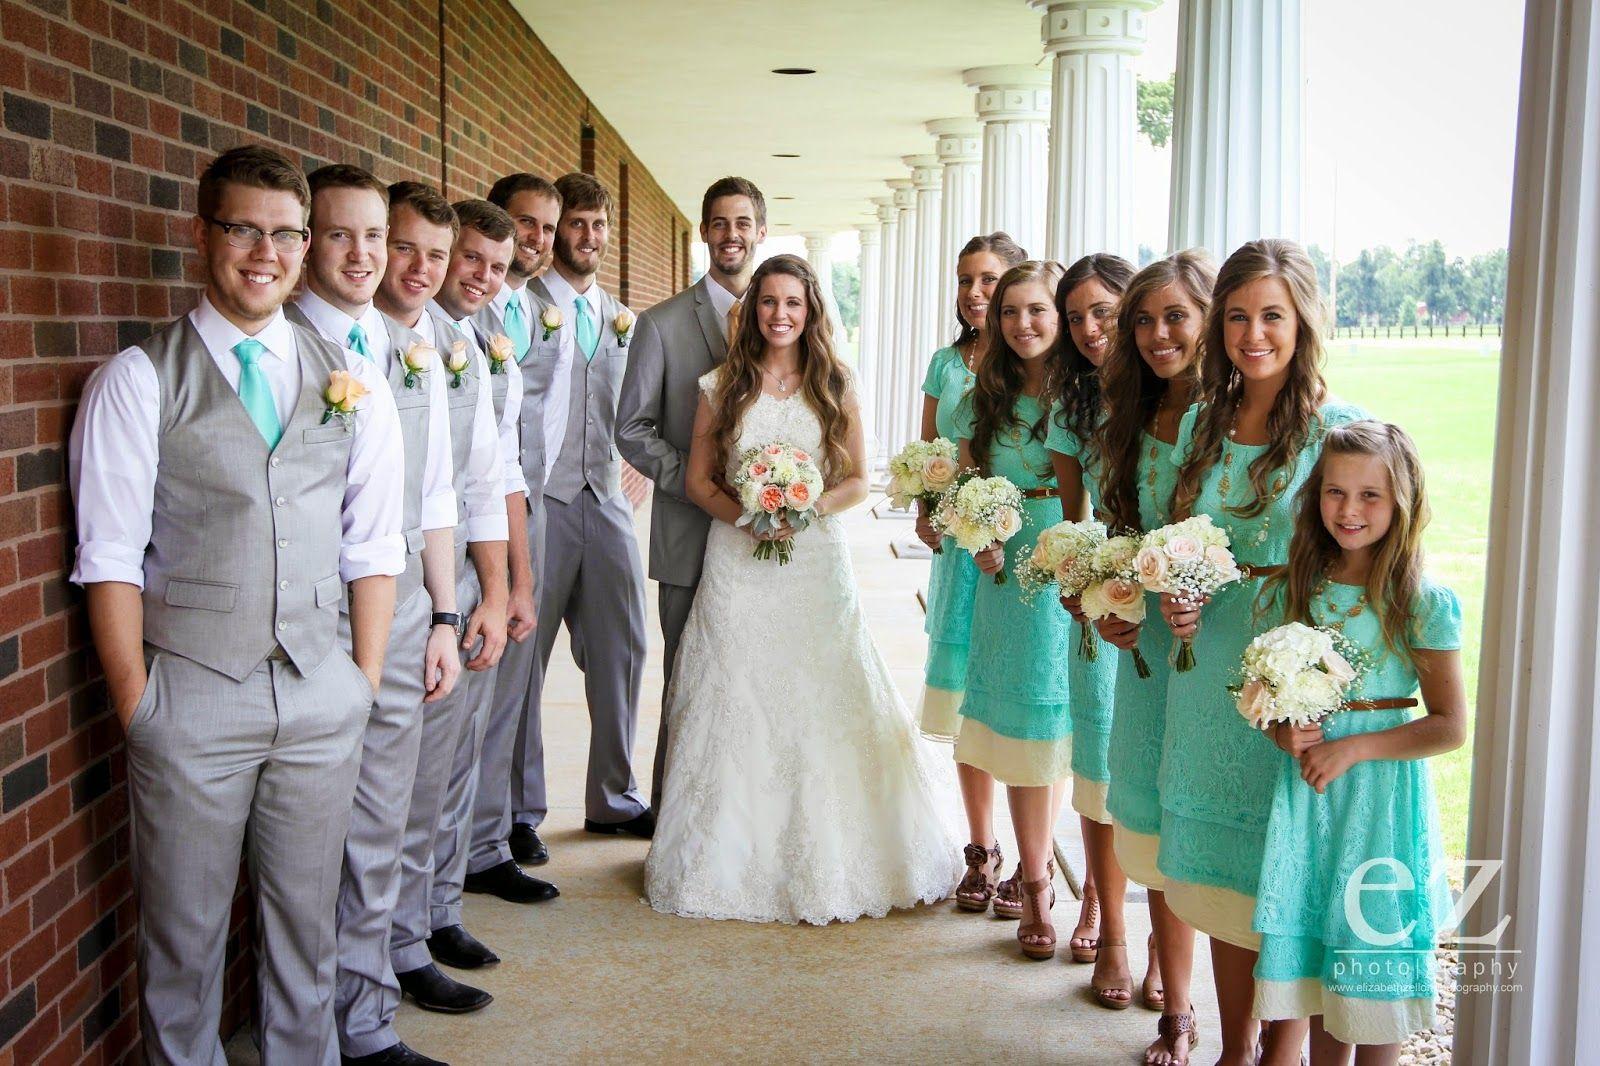 Photos Dillards First Look Wedding Party Duggar Wedding